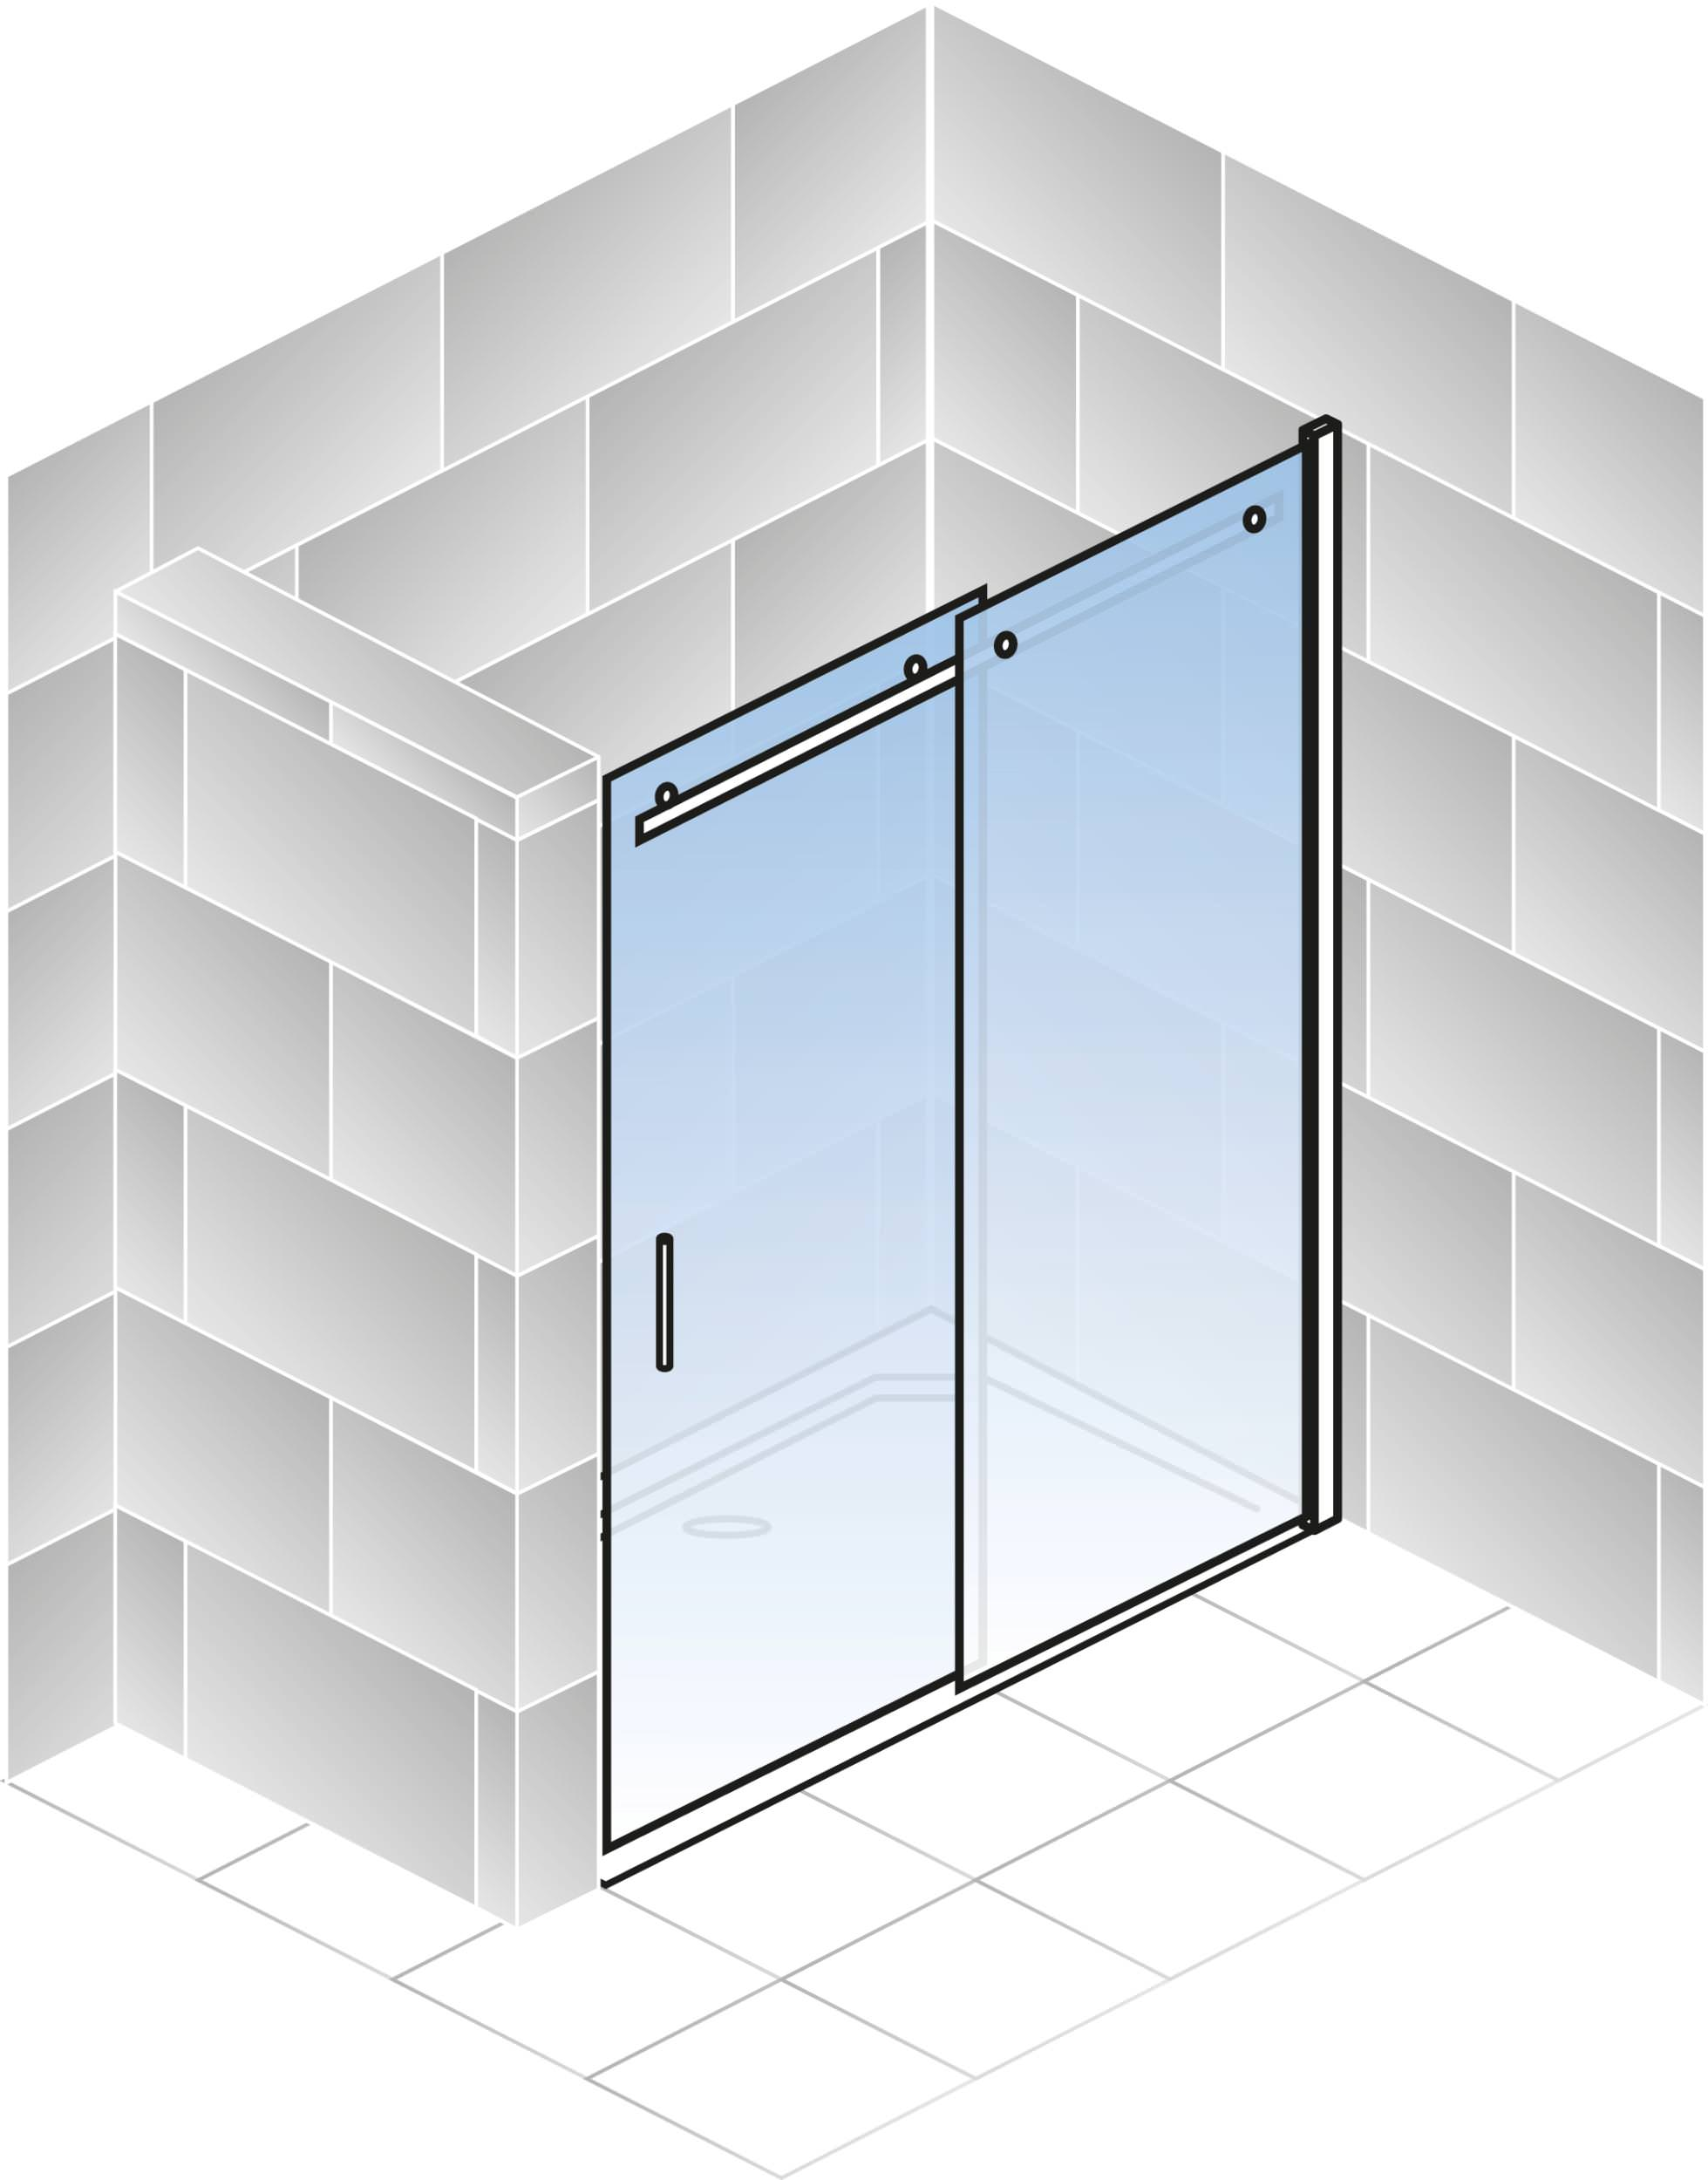 schulte alexa style 2 0 gleitt r f r nische klarglas hell chromoptik 120 cm 200 cm anschlag. Black Bedroom Furniture Sets. Home Design Ideas